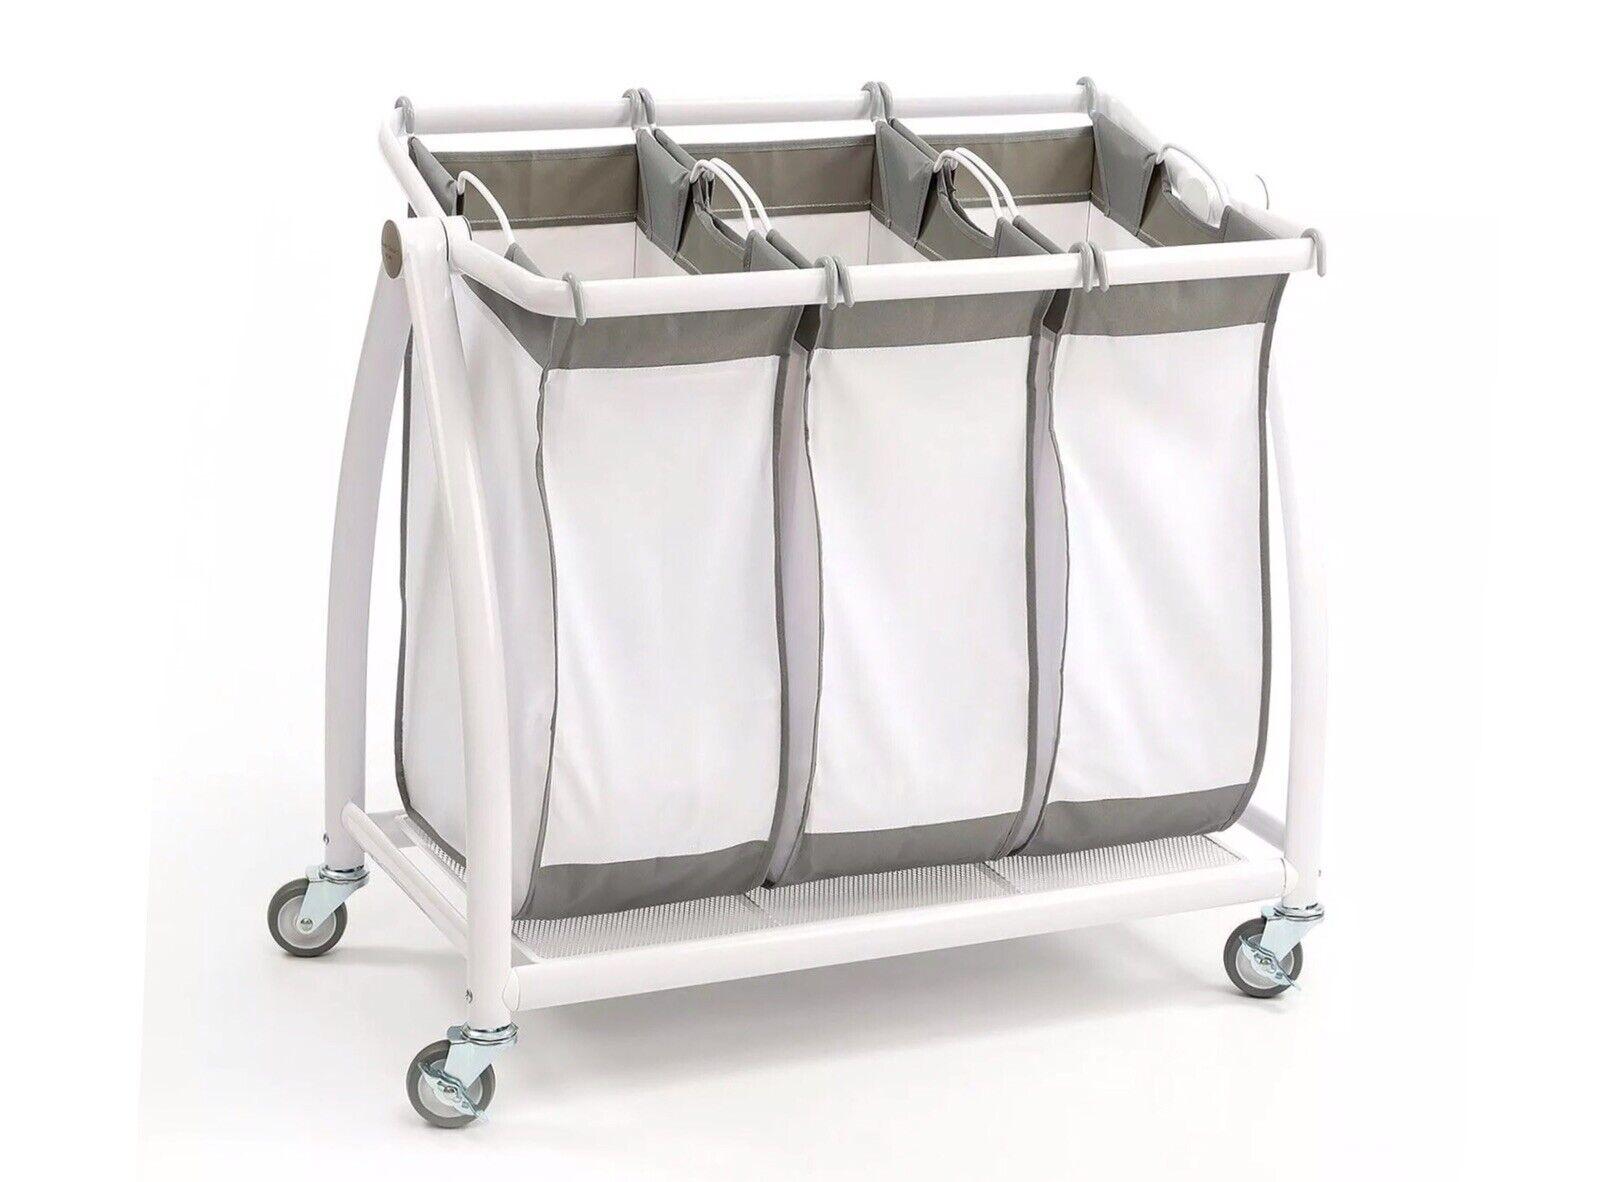 - Seville Classics 3-Bag Heavy-Duty Laundry Hamper Sorter Cart /w